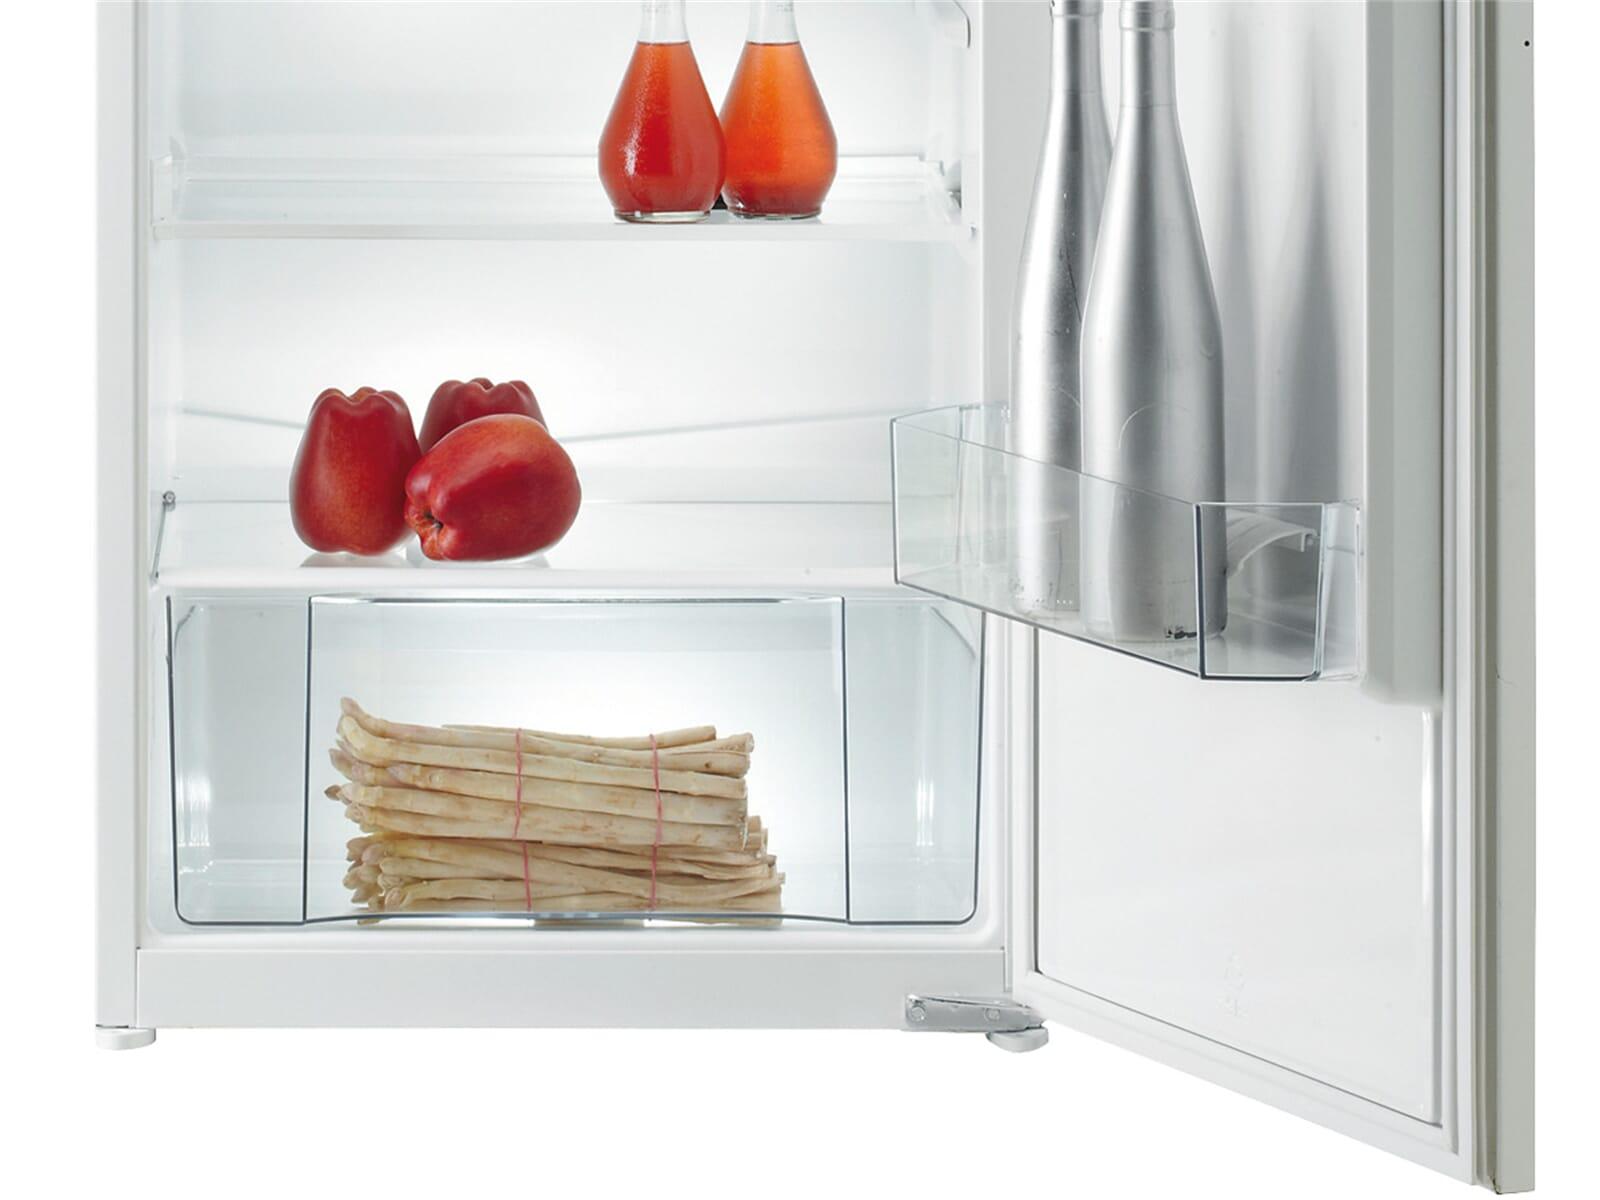 Gorenje Kühlschrank Idealo : Gorenje rbi aw einbaukühlschrank